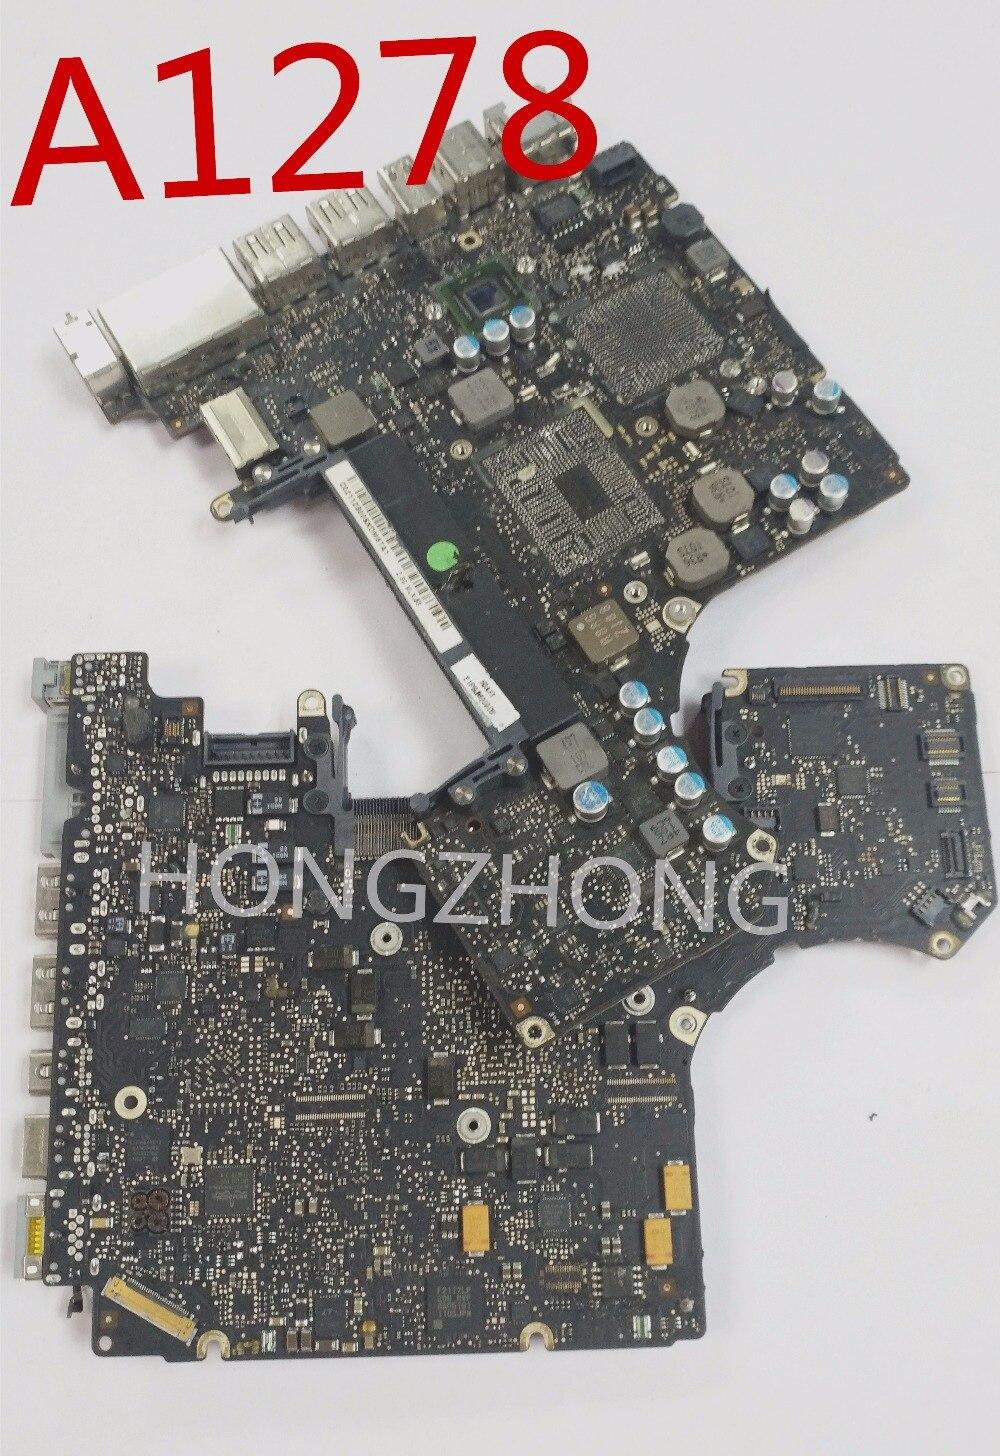 A1278 820-2936-a 820-2936-B 820-2936 With SMC/BIOS Broken Logic Board For 13